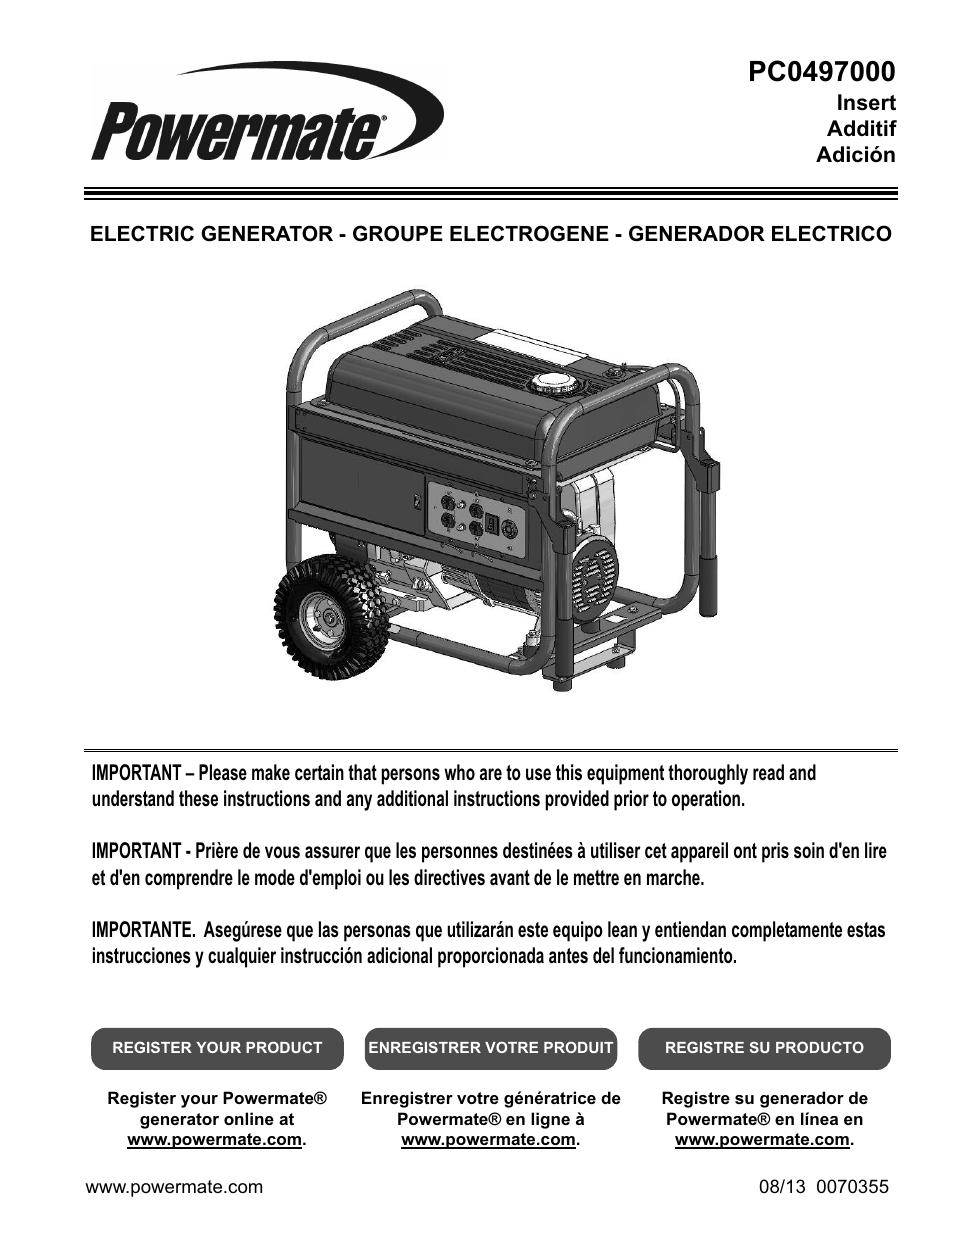 Powermate PC0497000 User Manual | 12 pages